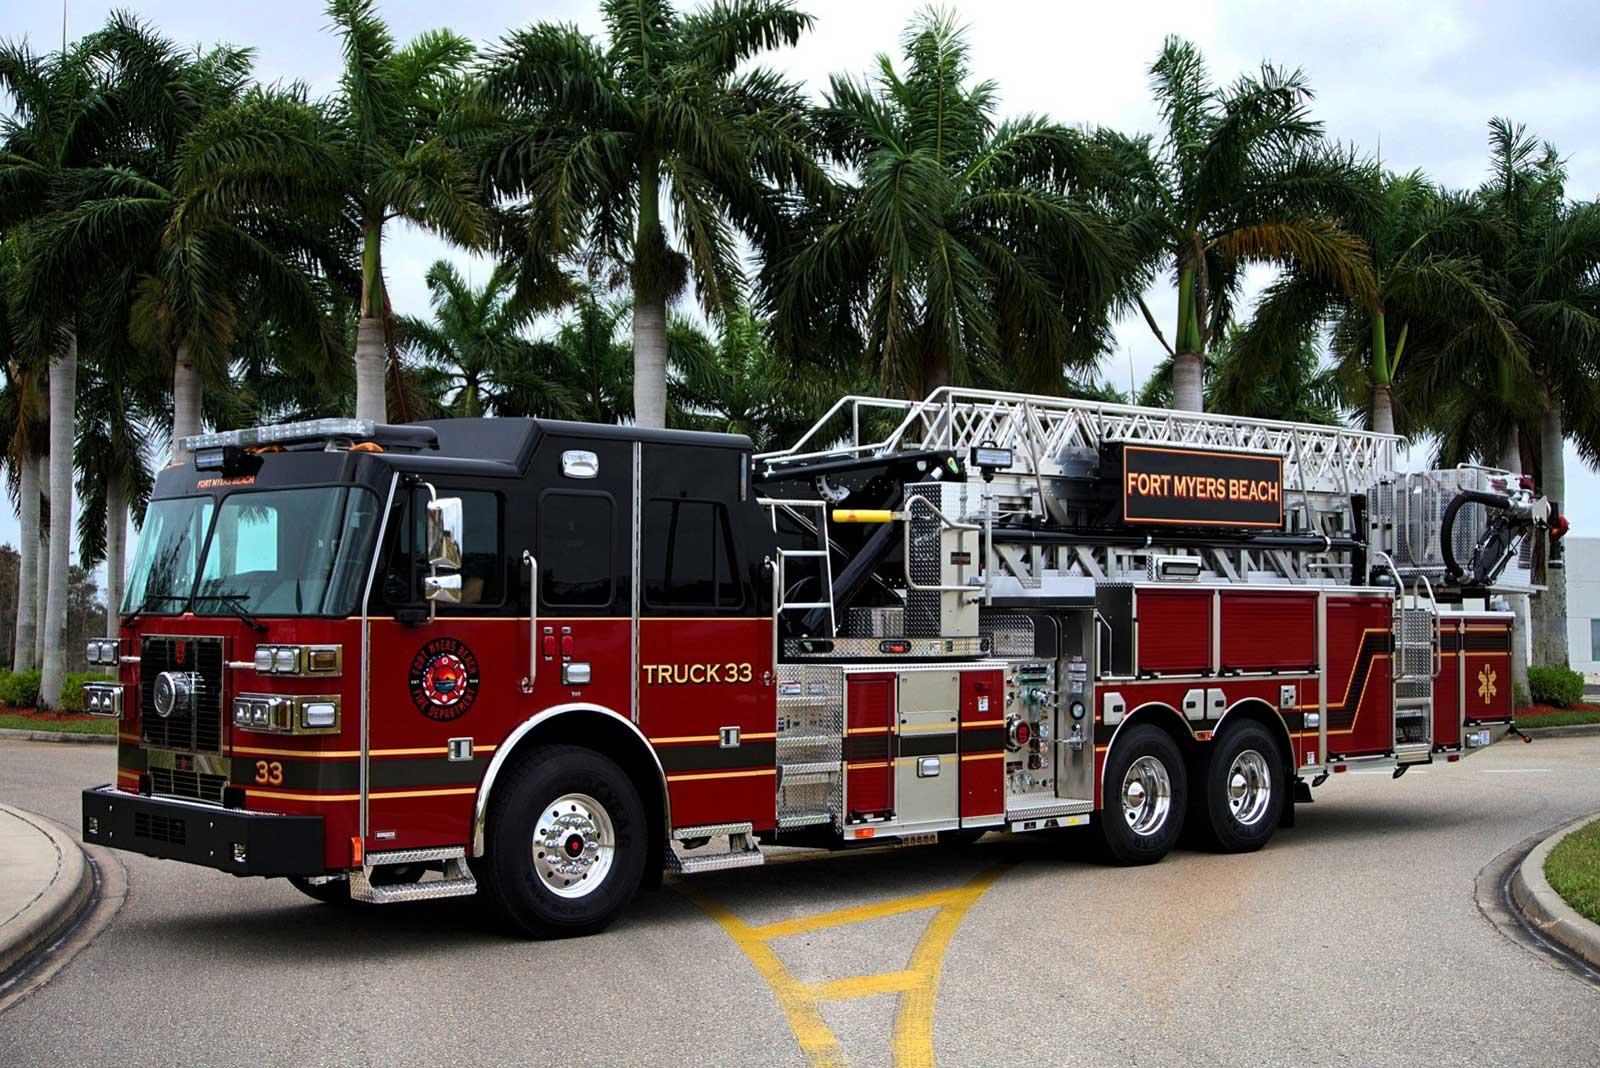 Fort Myers Beach FL fire apparatus